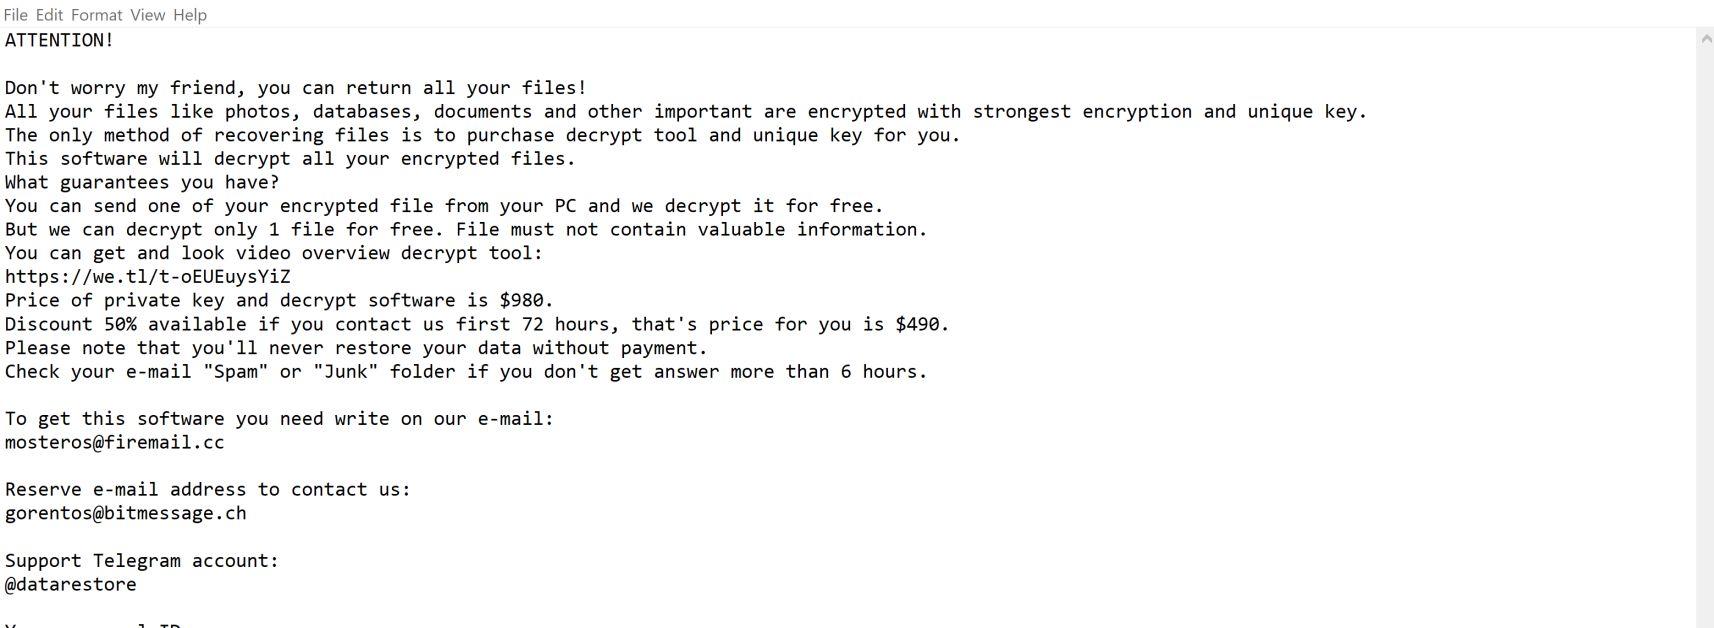 Image: Codnat ransomware